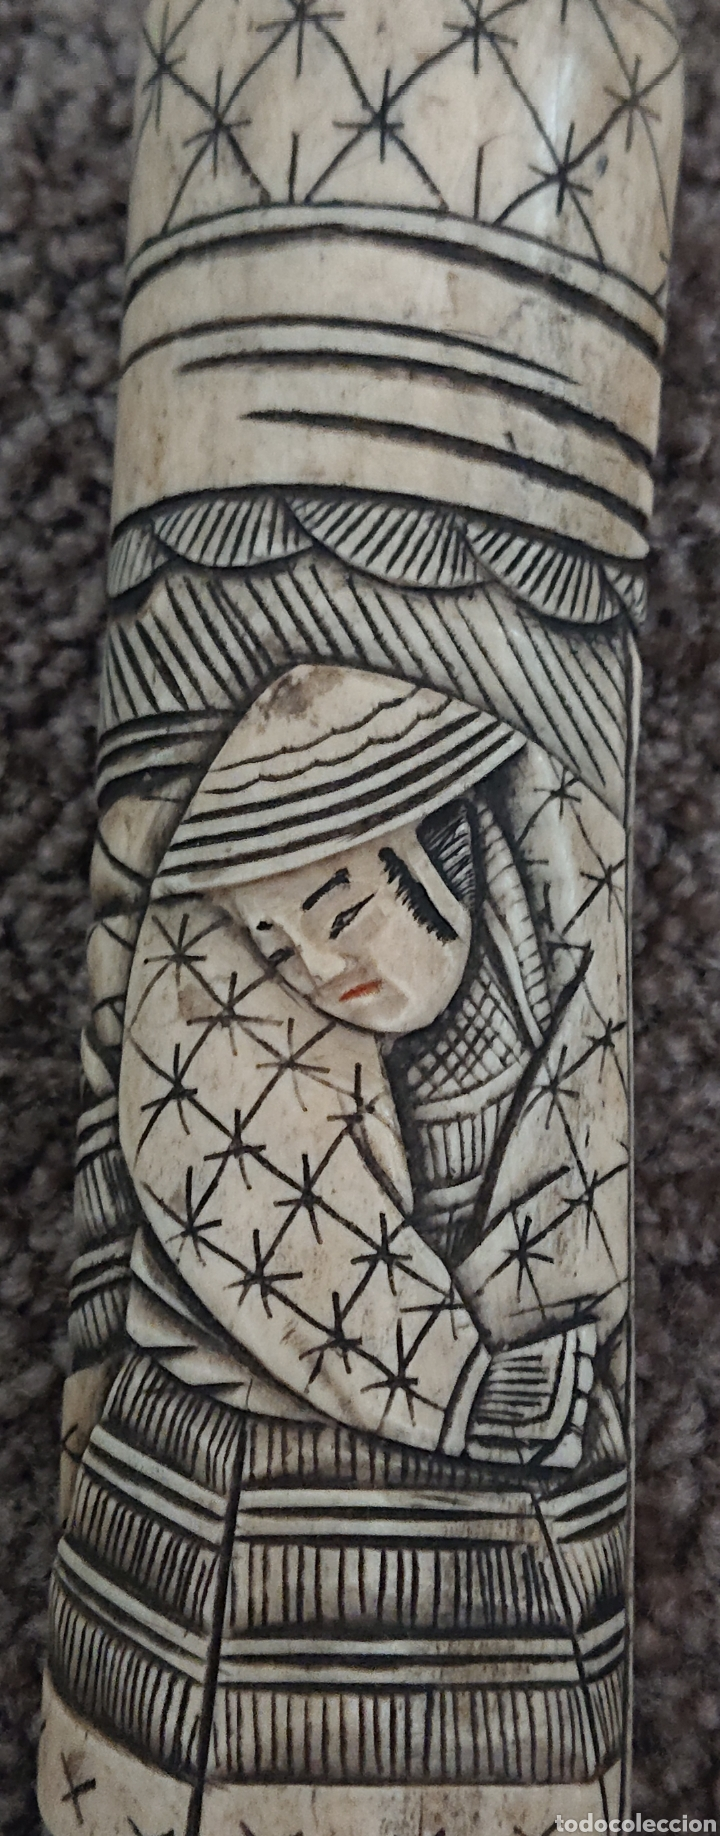 Arte: Funda sable o espada japonés, Japón, hueso o similar, gran pieza, ved fotos - Foto 4 - 276801593